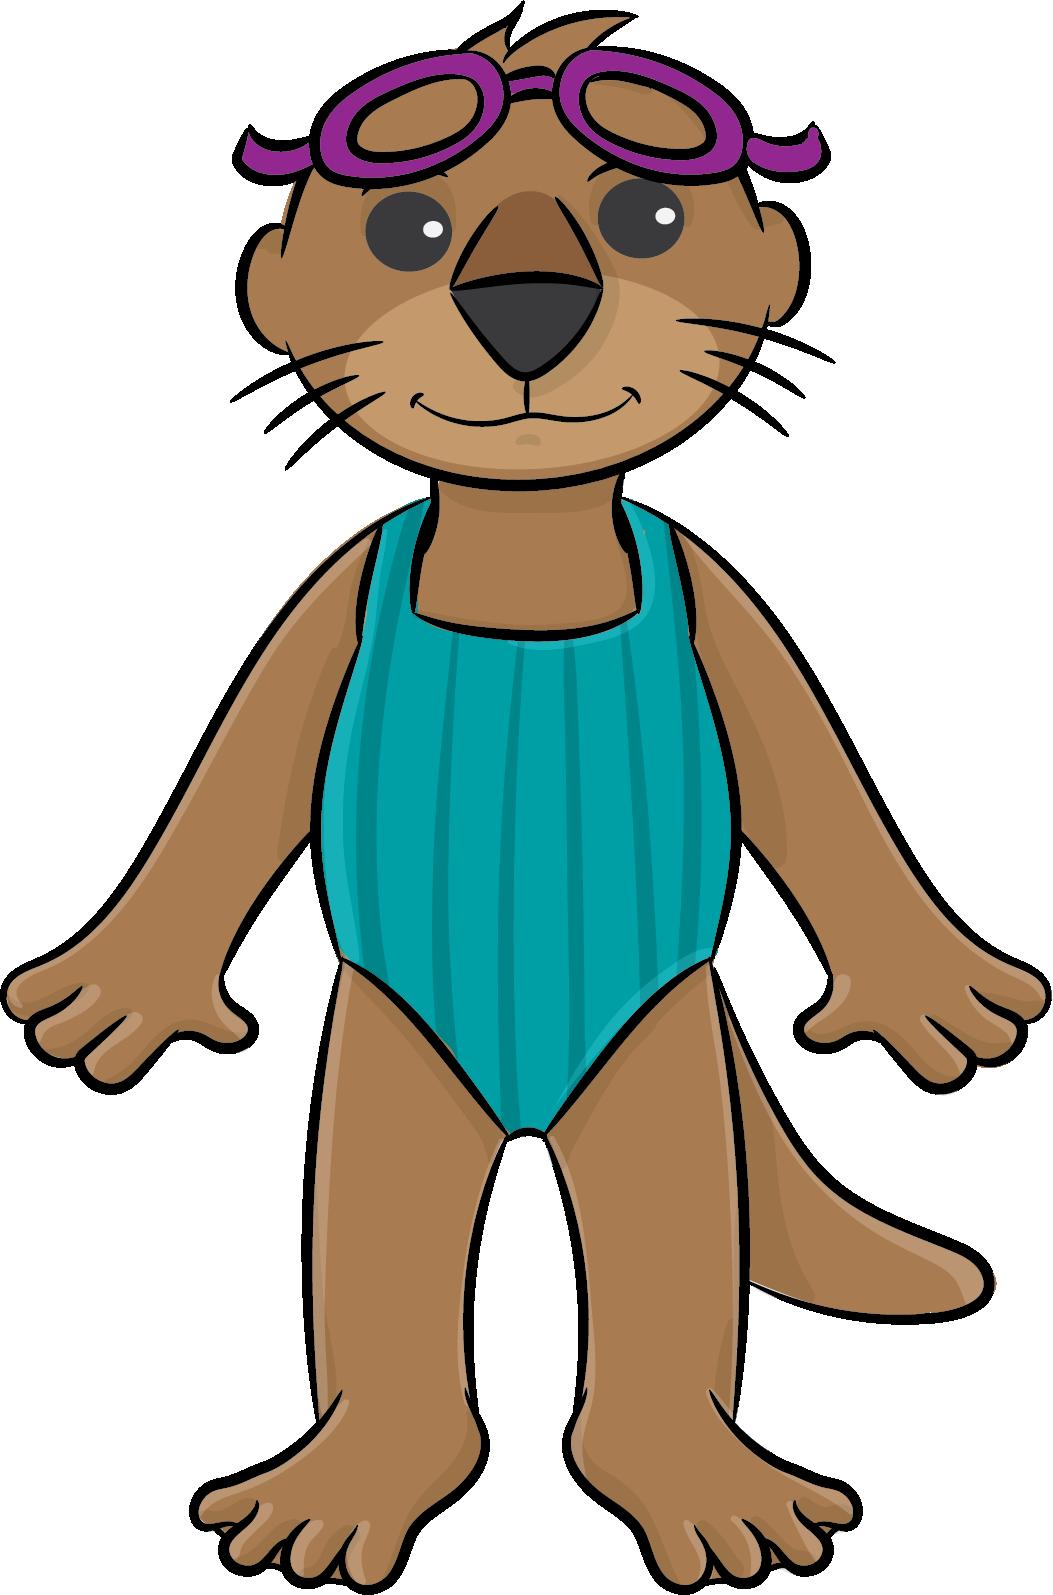 Otter Baby III - Little Otter Swim School